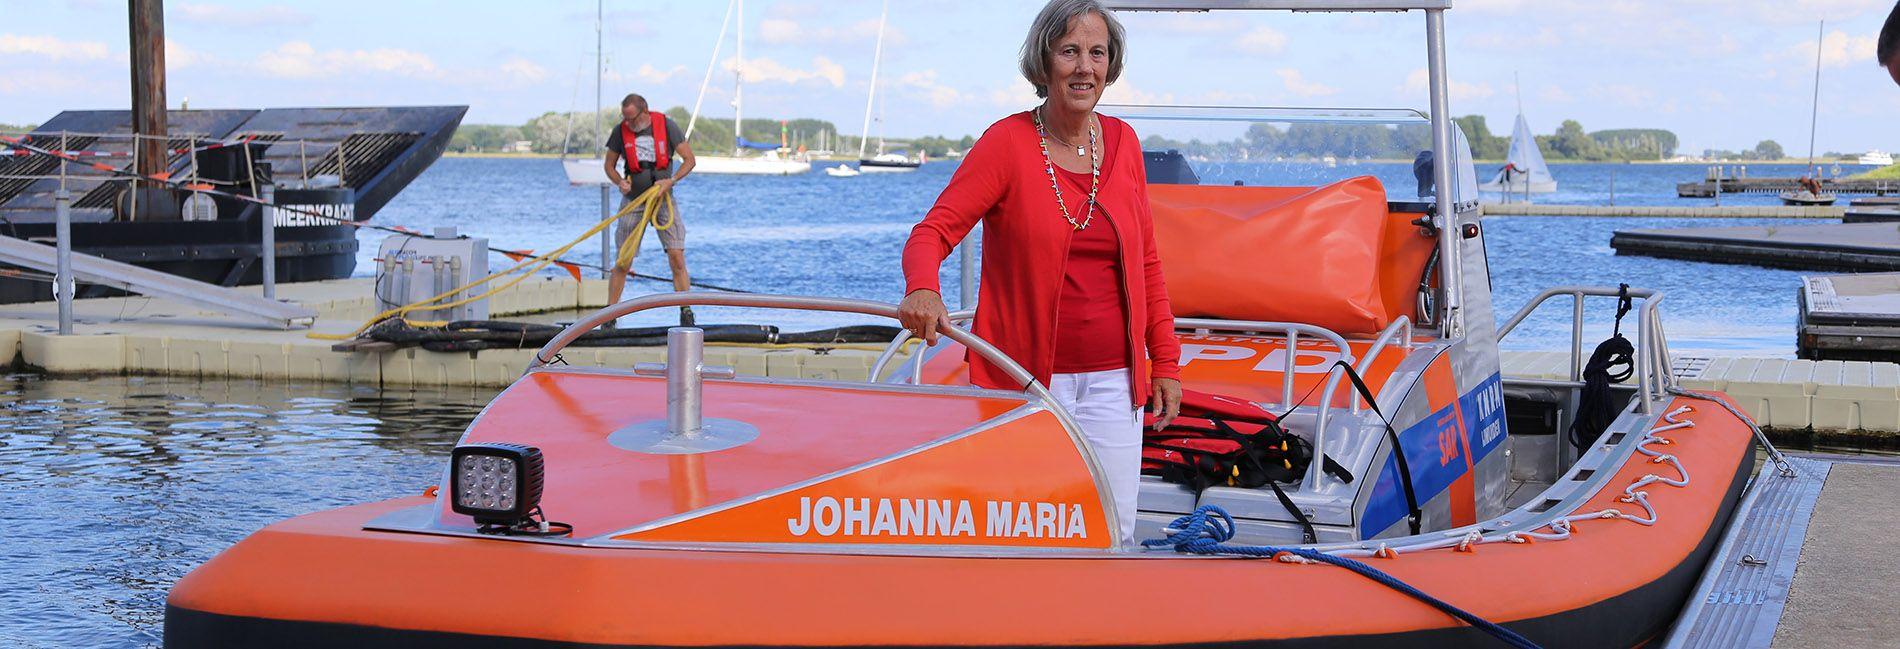 Reddingboot Johanna Maria